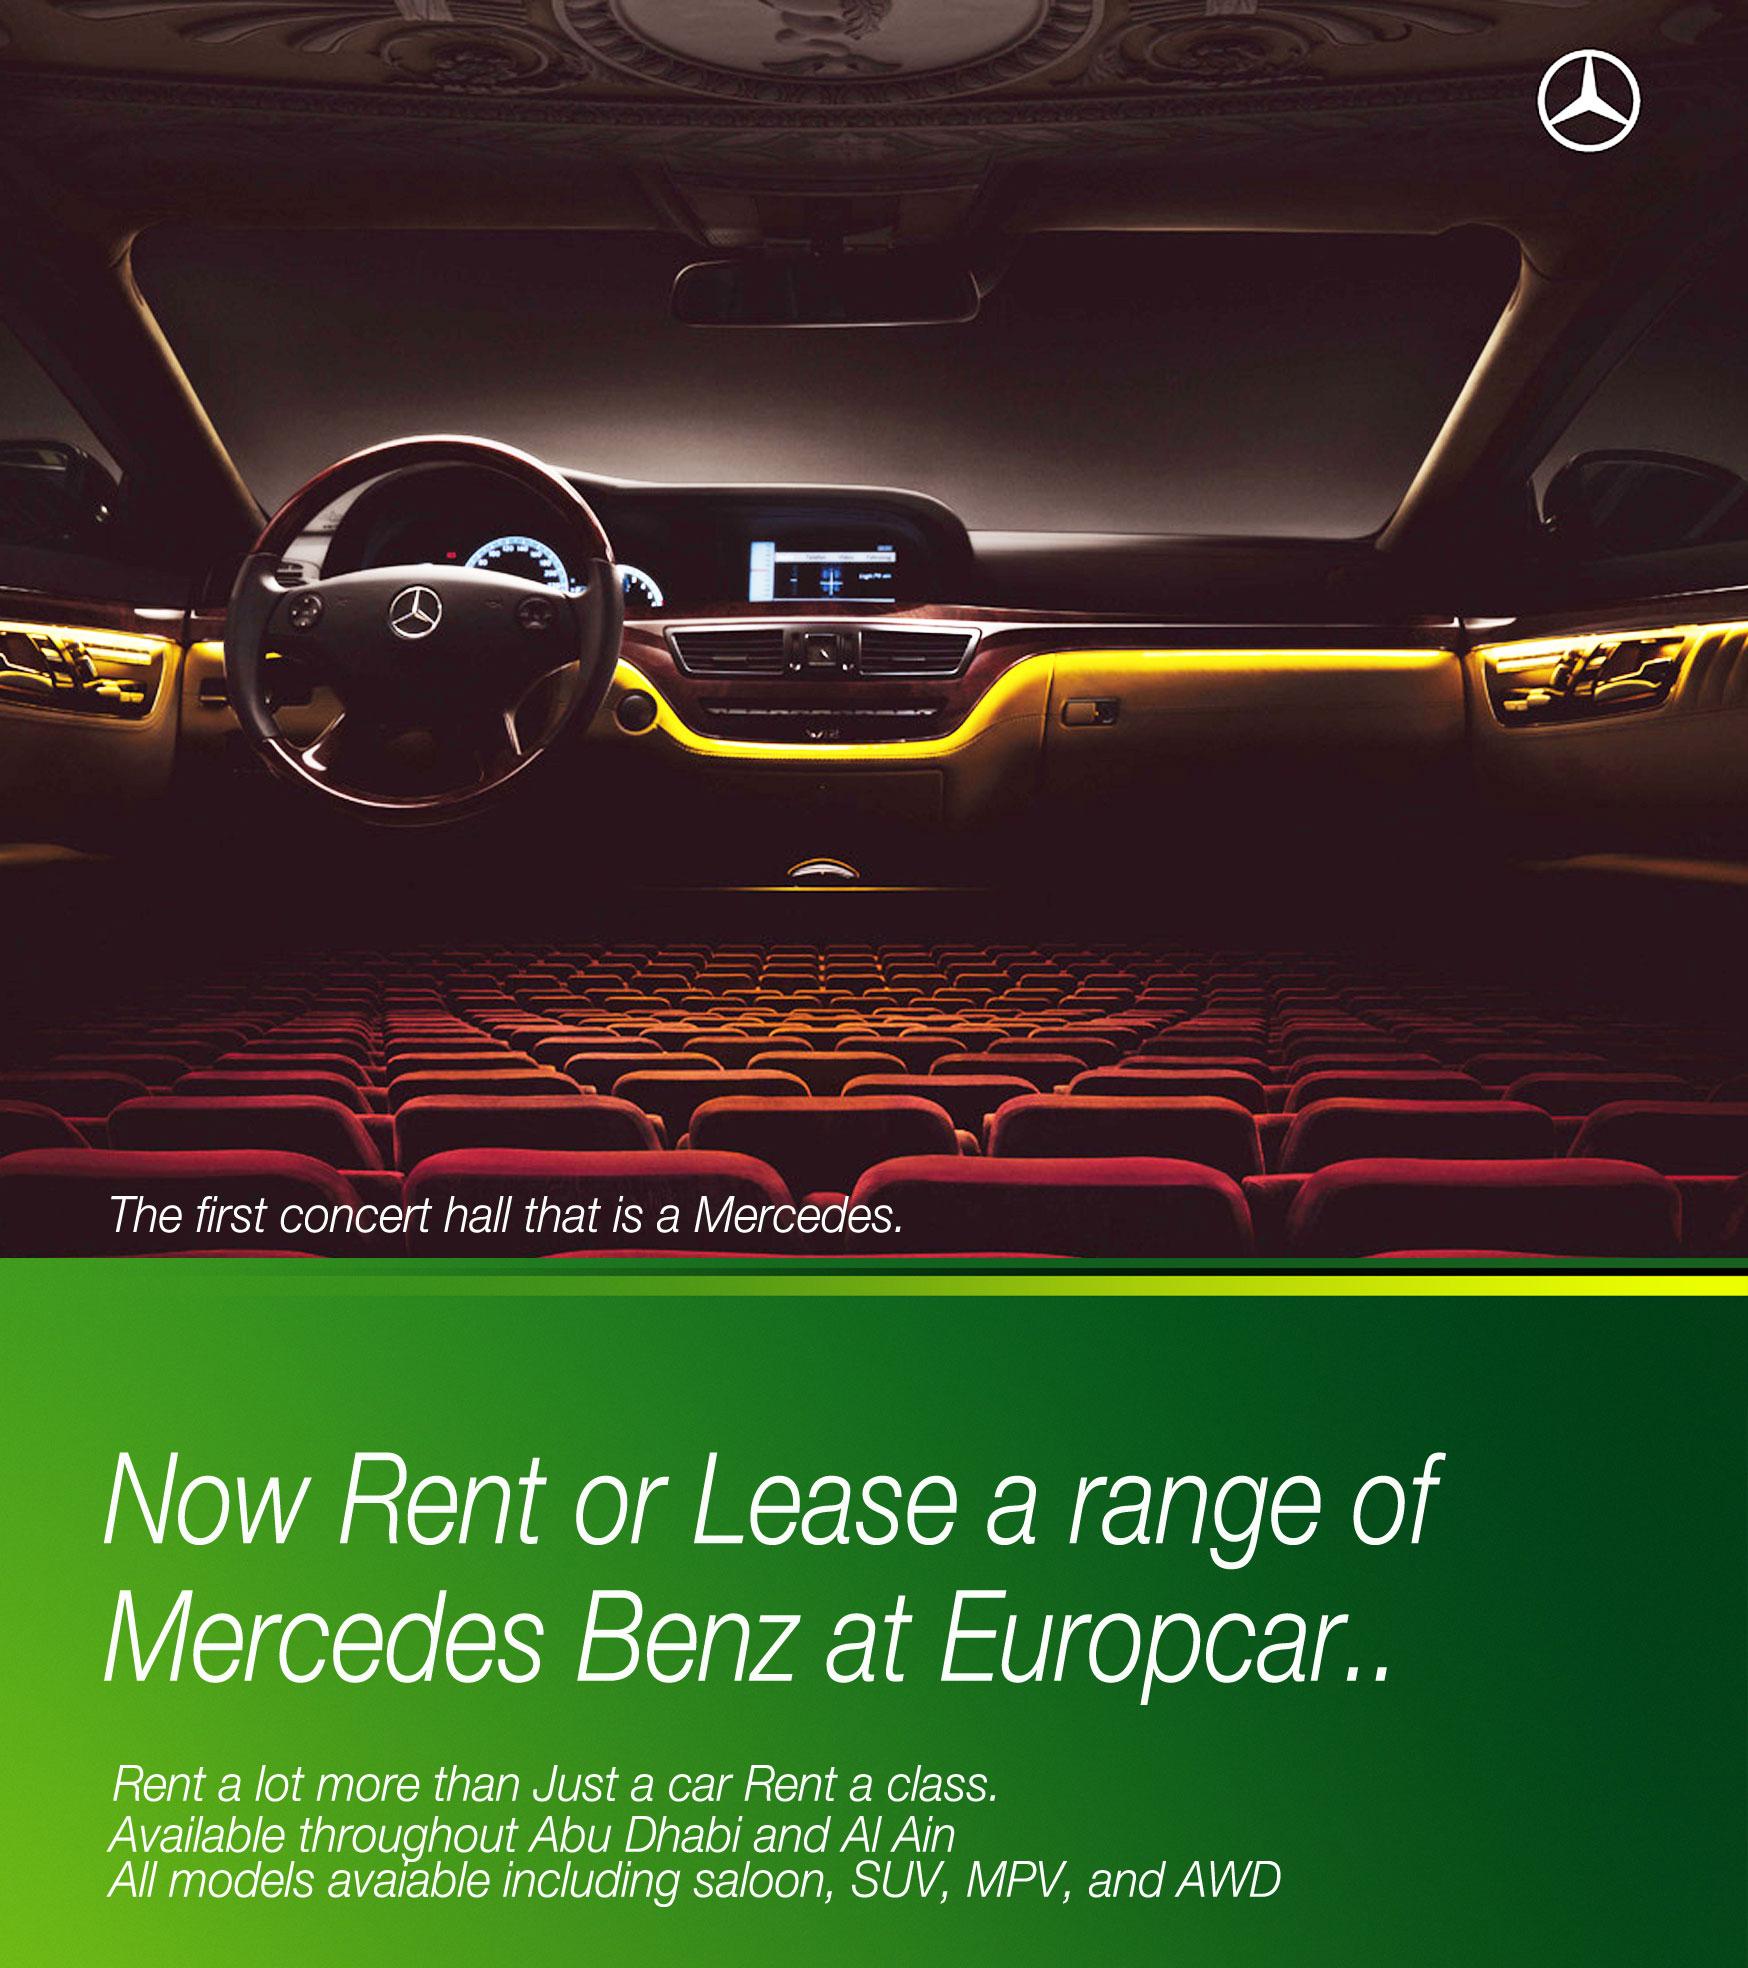 Europcar Abu Dhabi Mercedes